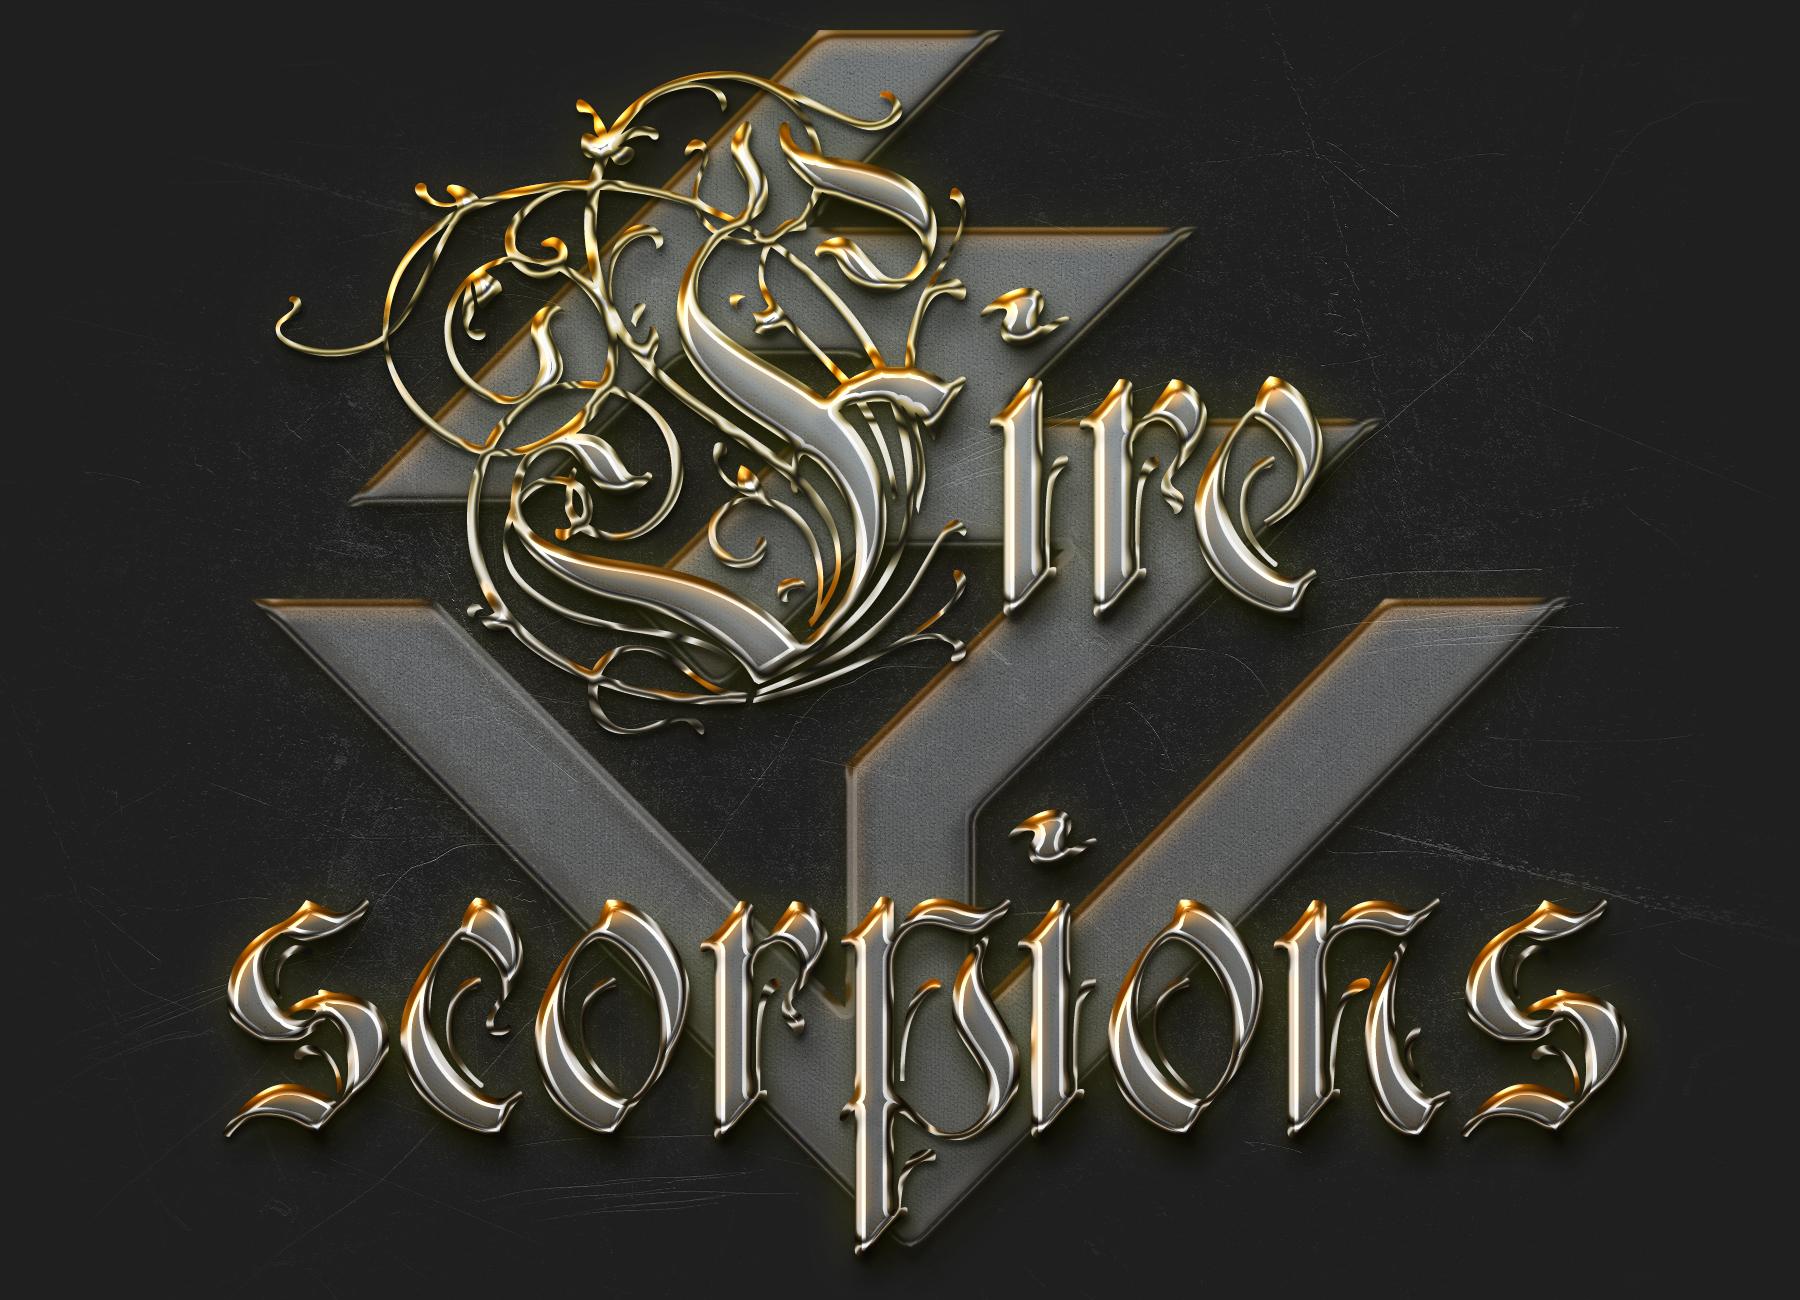 Fire Scorpions.jpg